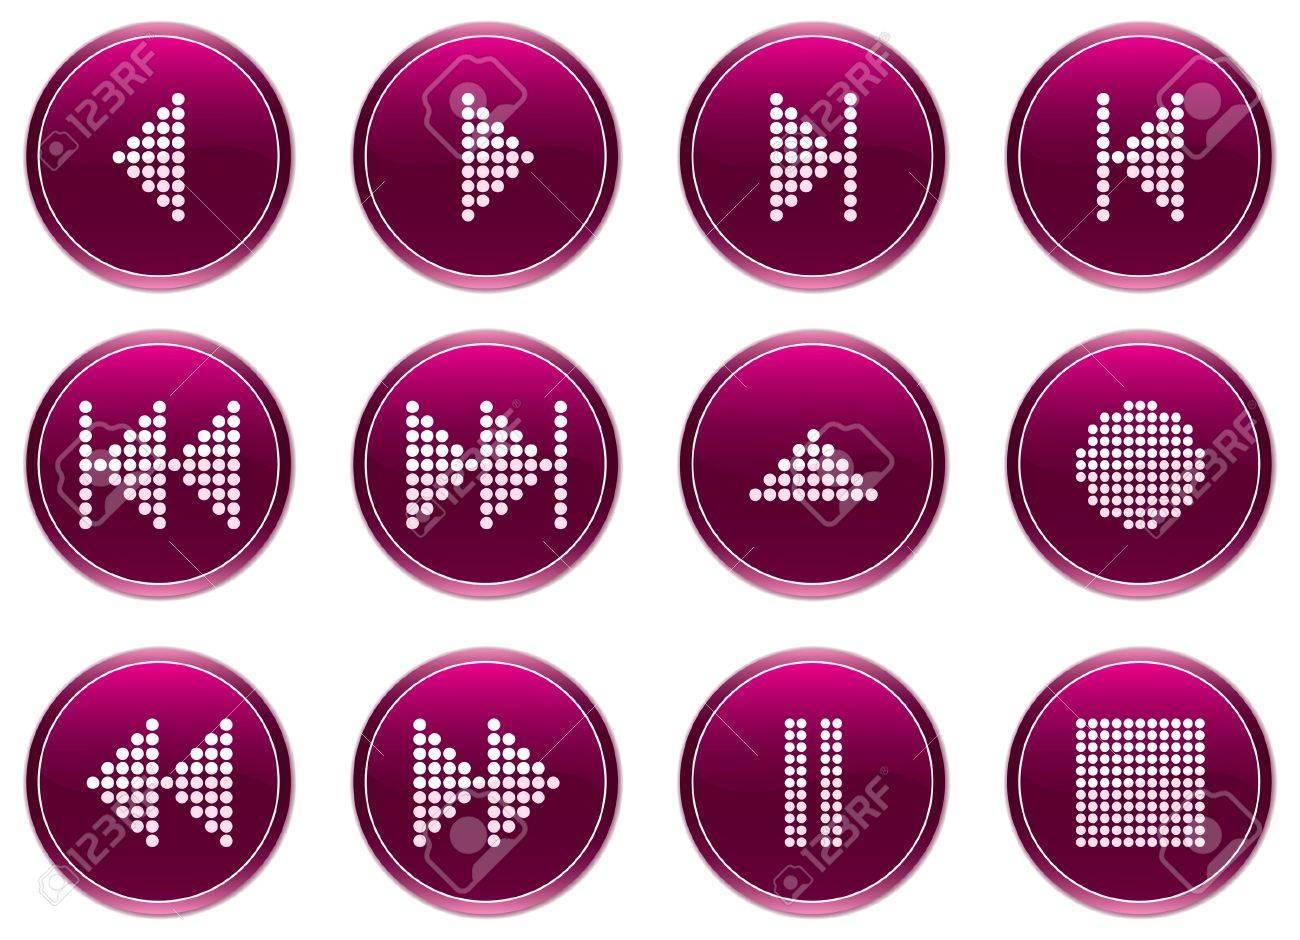 Multimedia navigation buttons set. White - purple palette. Vector illustration. Stock Vector - 3858319